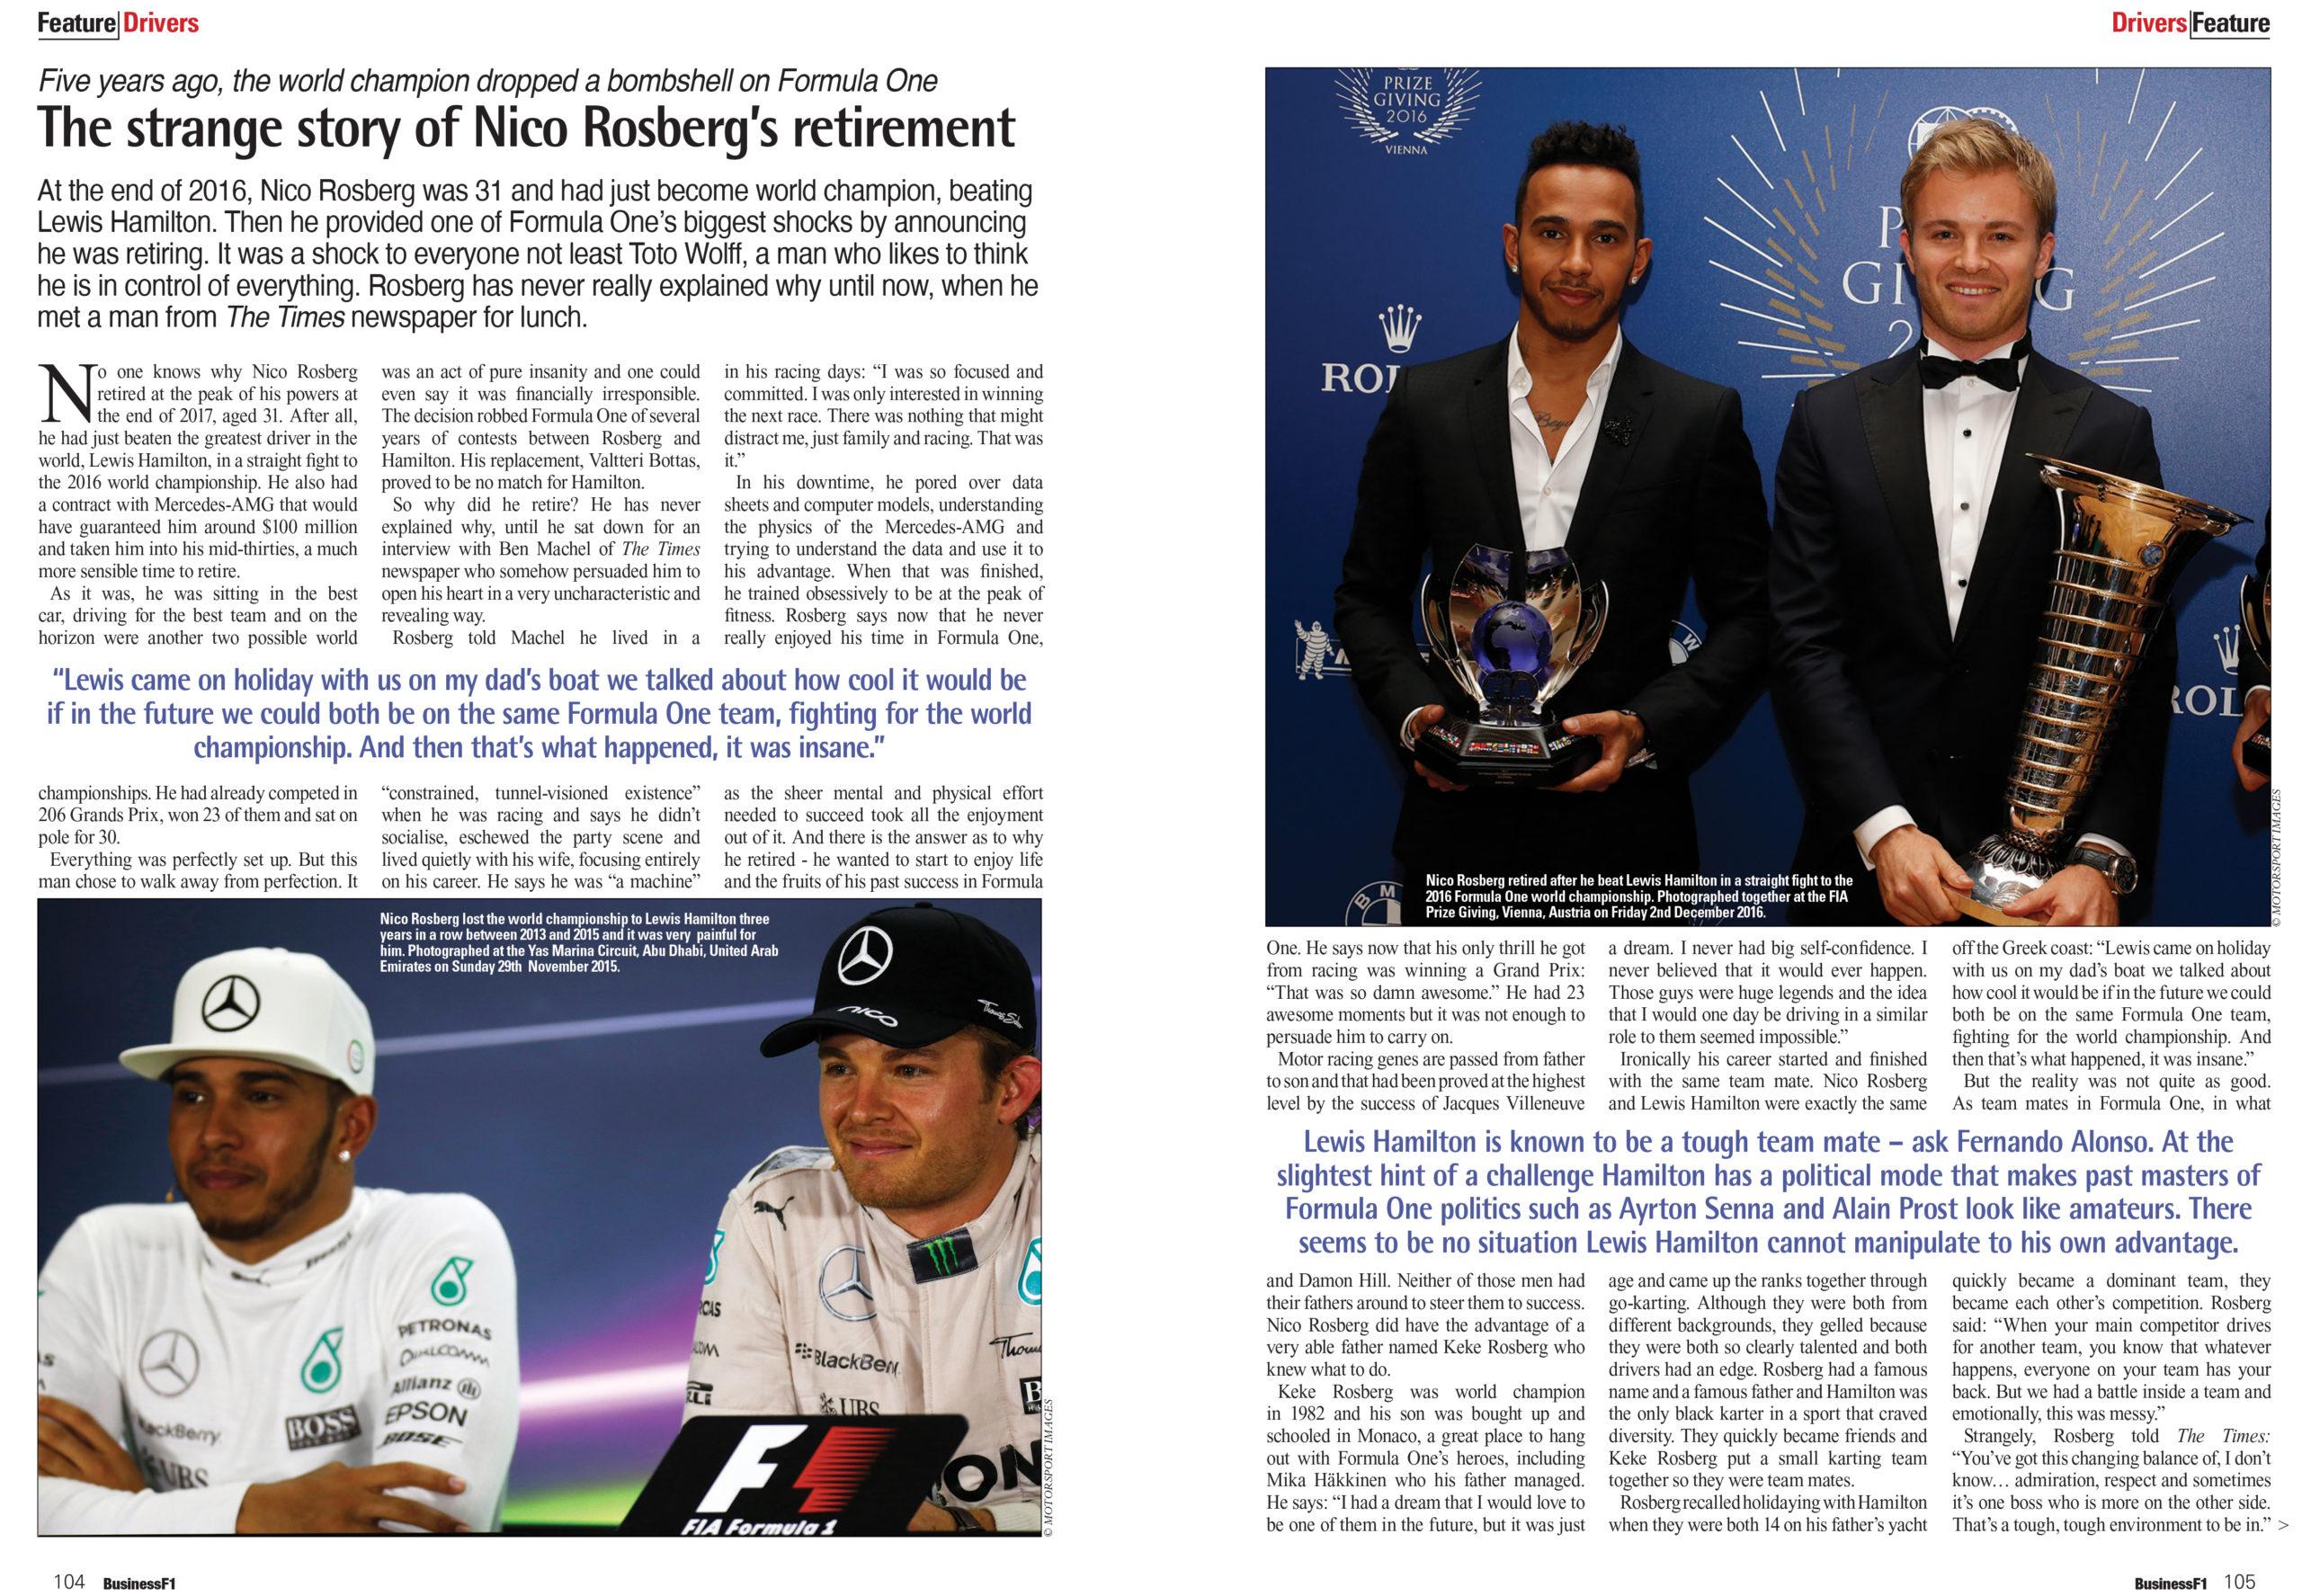 104_Insight_Nico_Rosbergs_Retirement